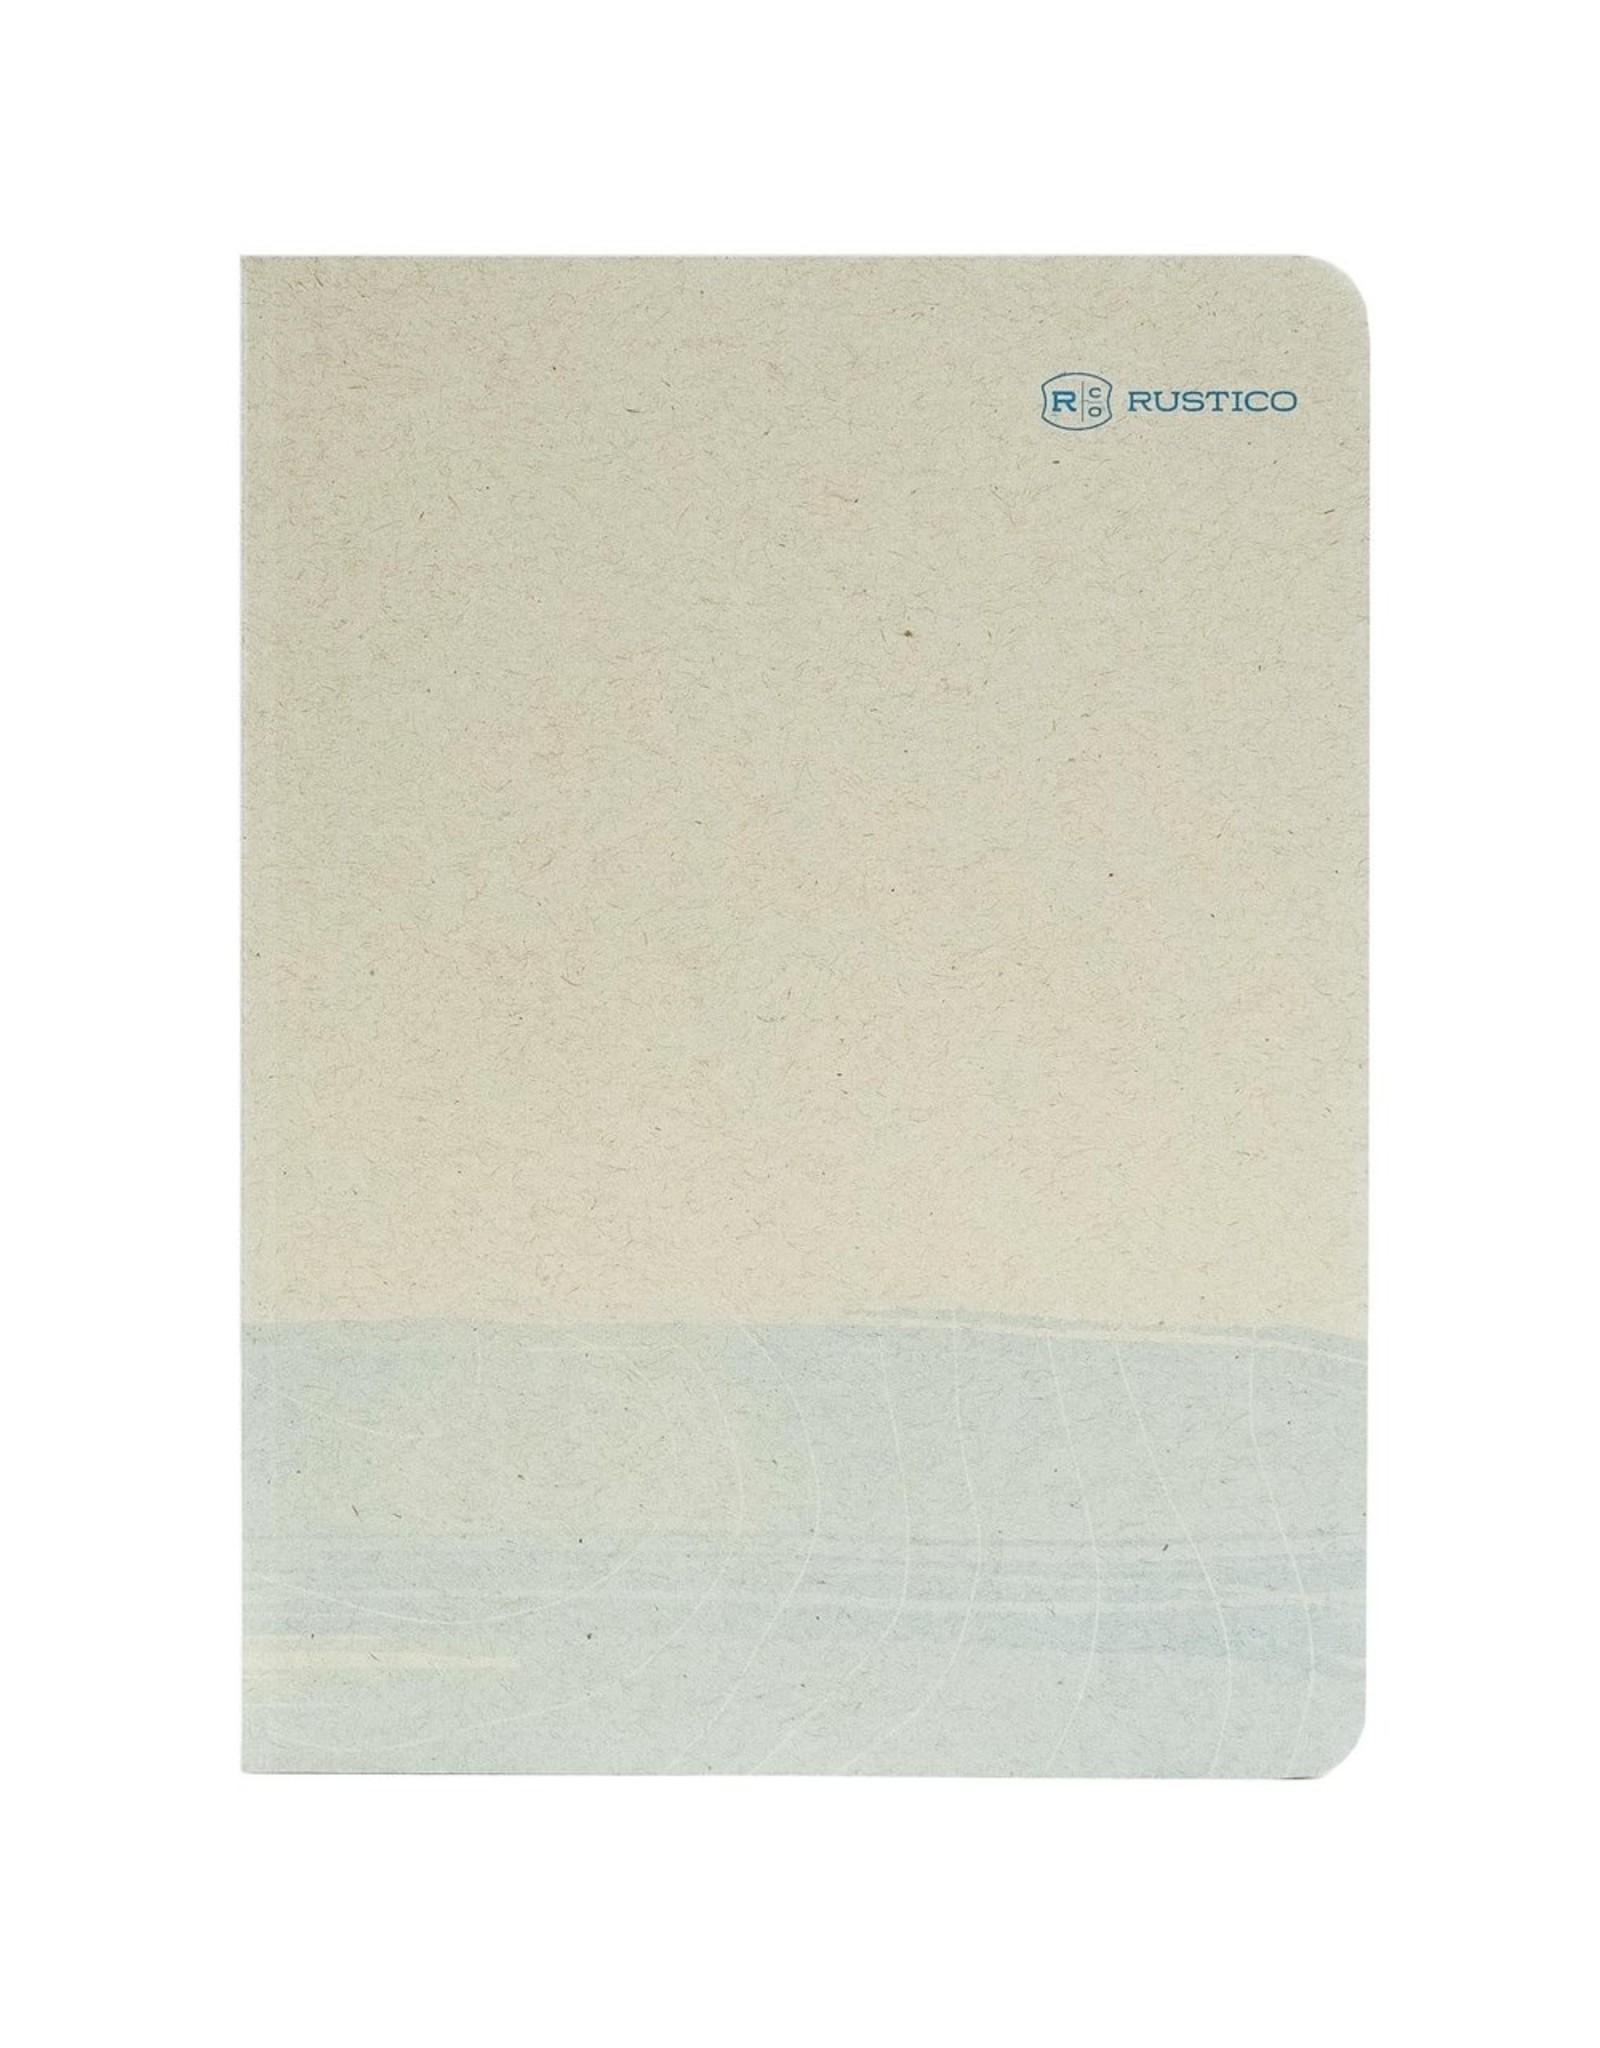 Rustico Premium Refills for Wasatch Notebook